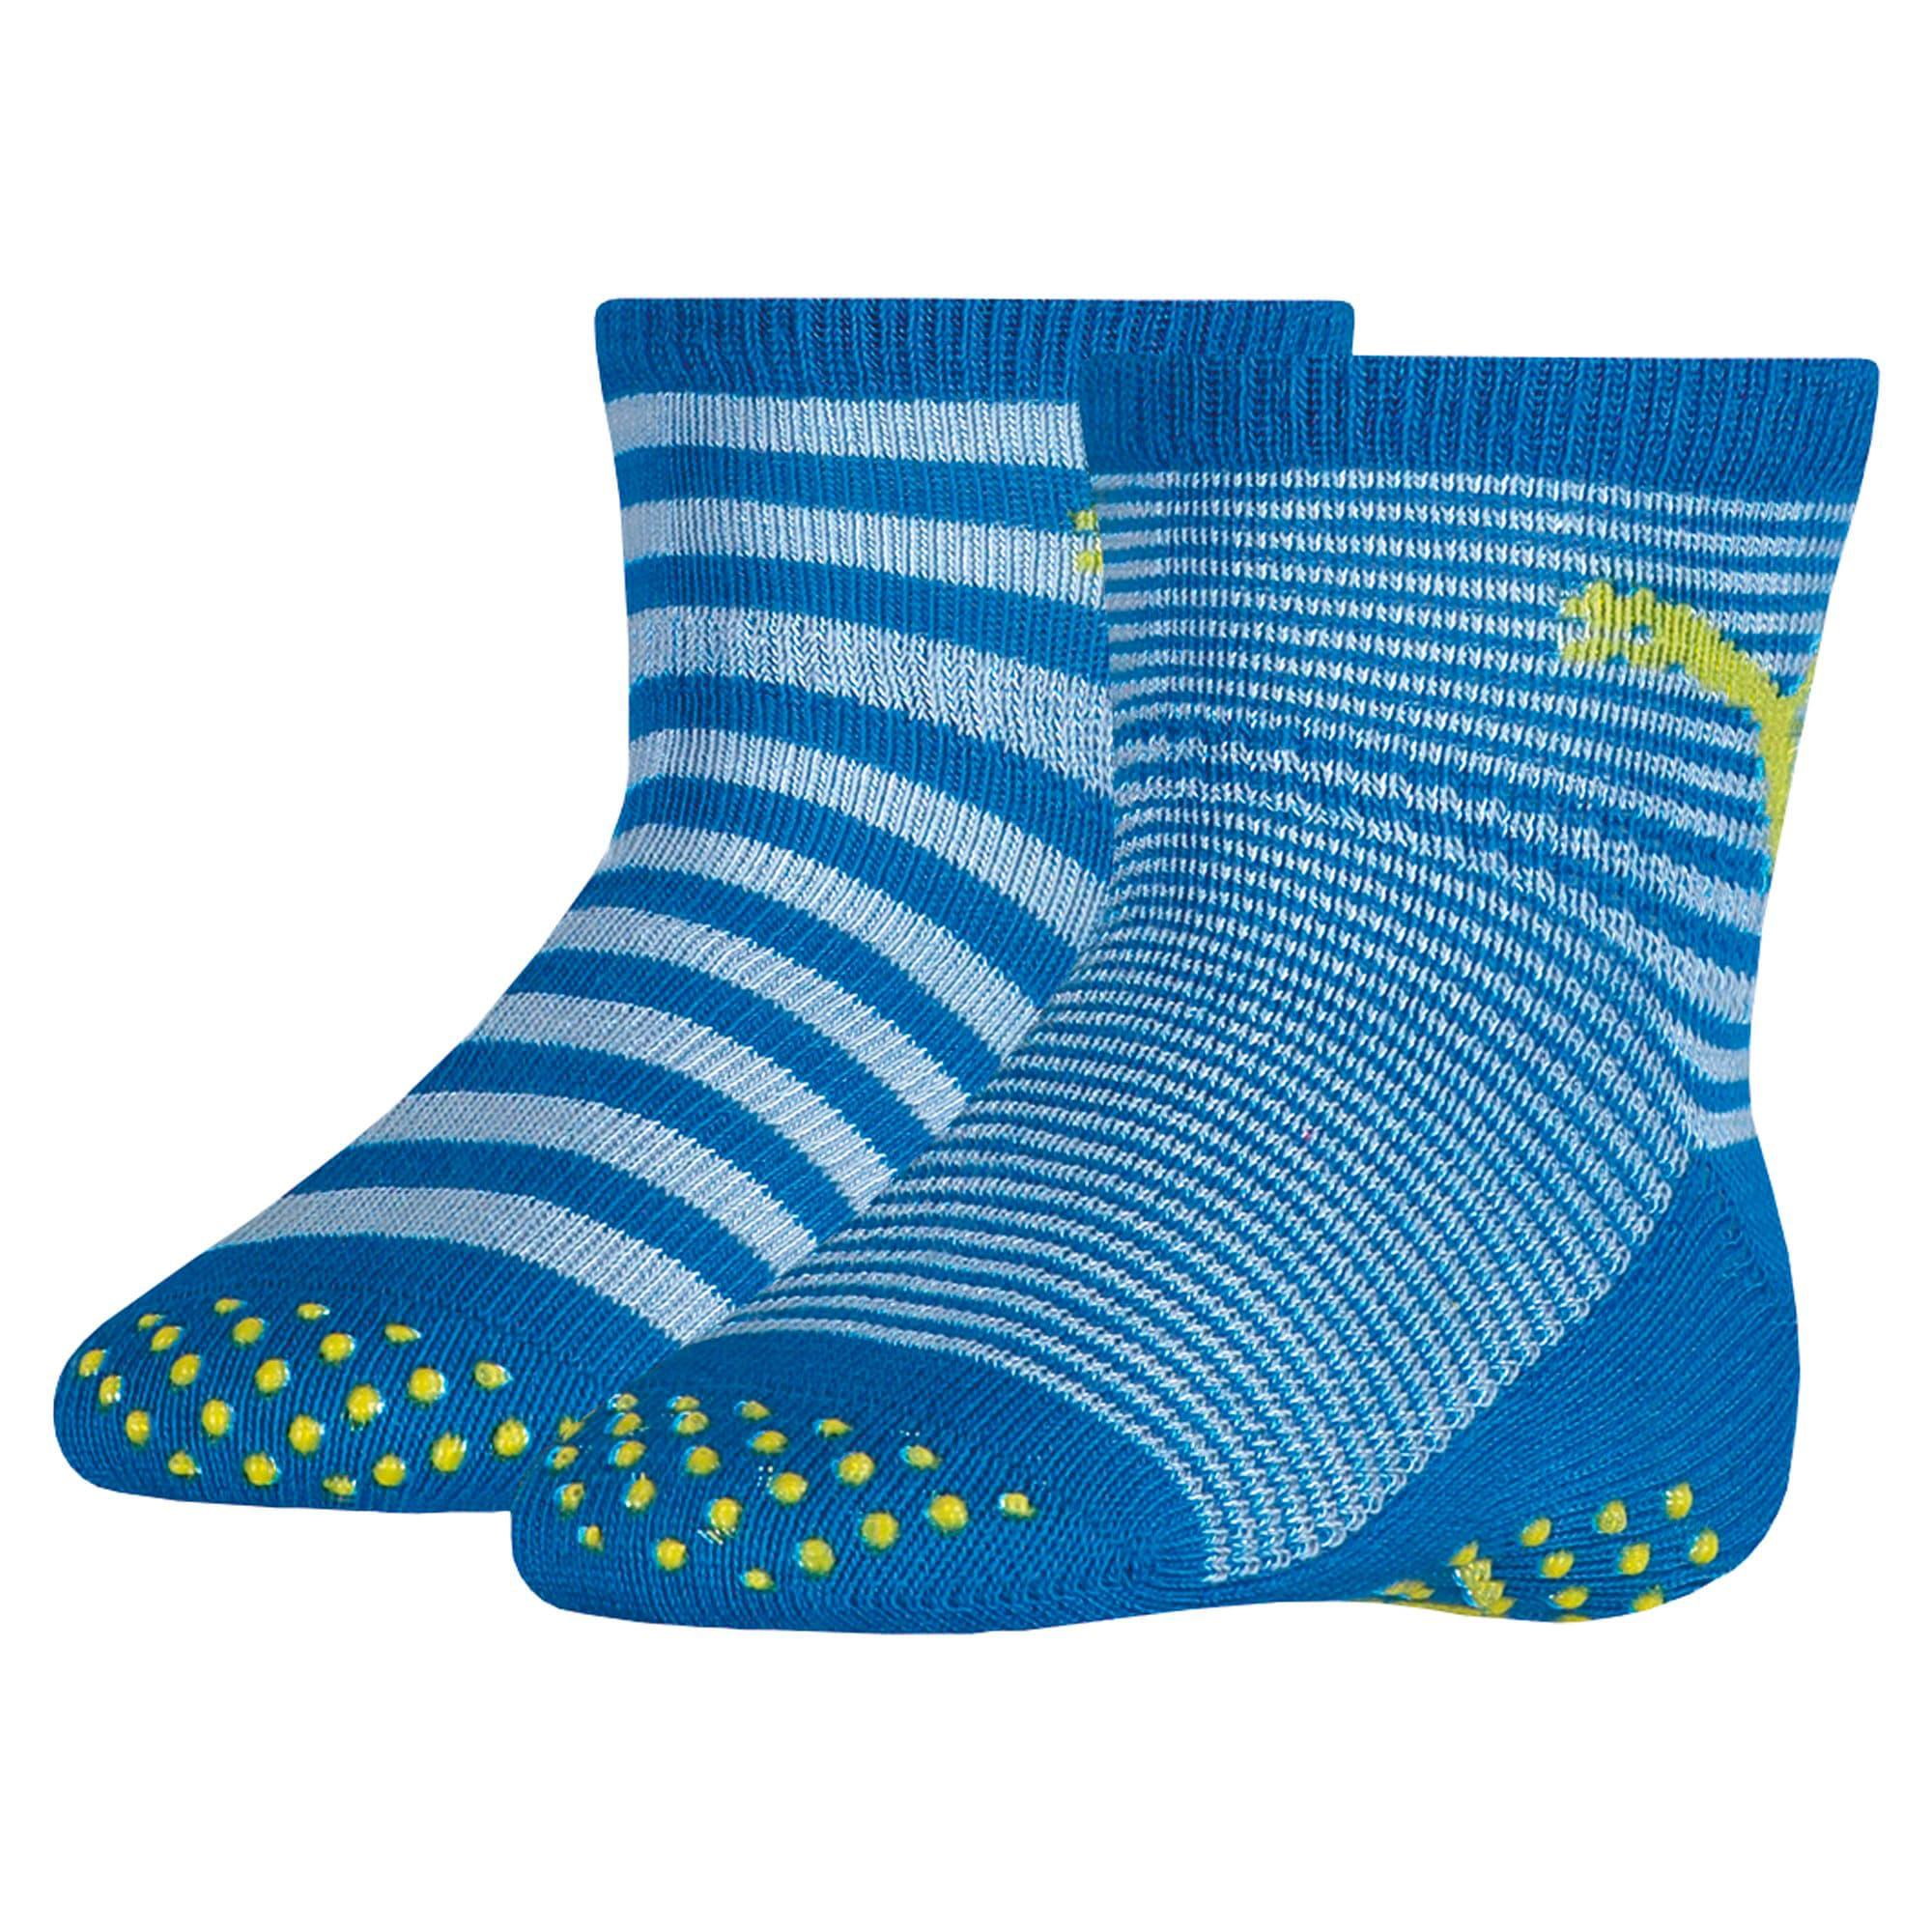 2er Pack Herstellergr/ö/ße: 19//22 One size Grau PUMA Baby-Jungen Abs 2p Socken Grey M/élange 032